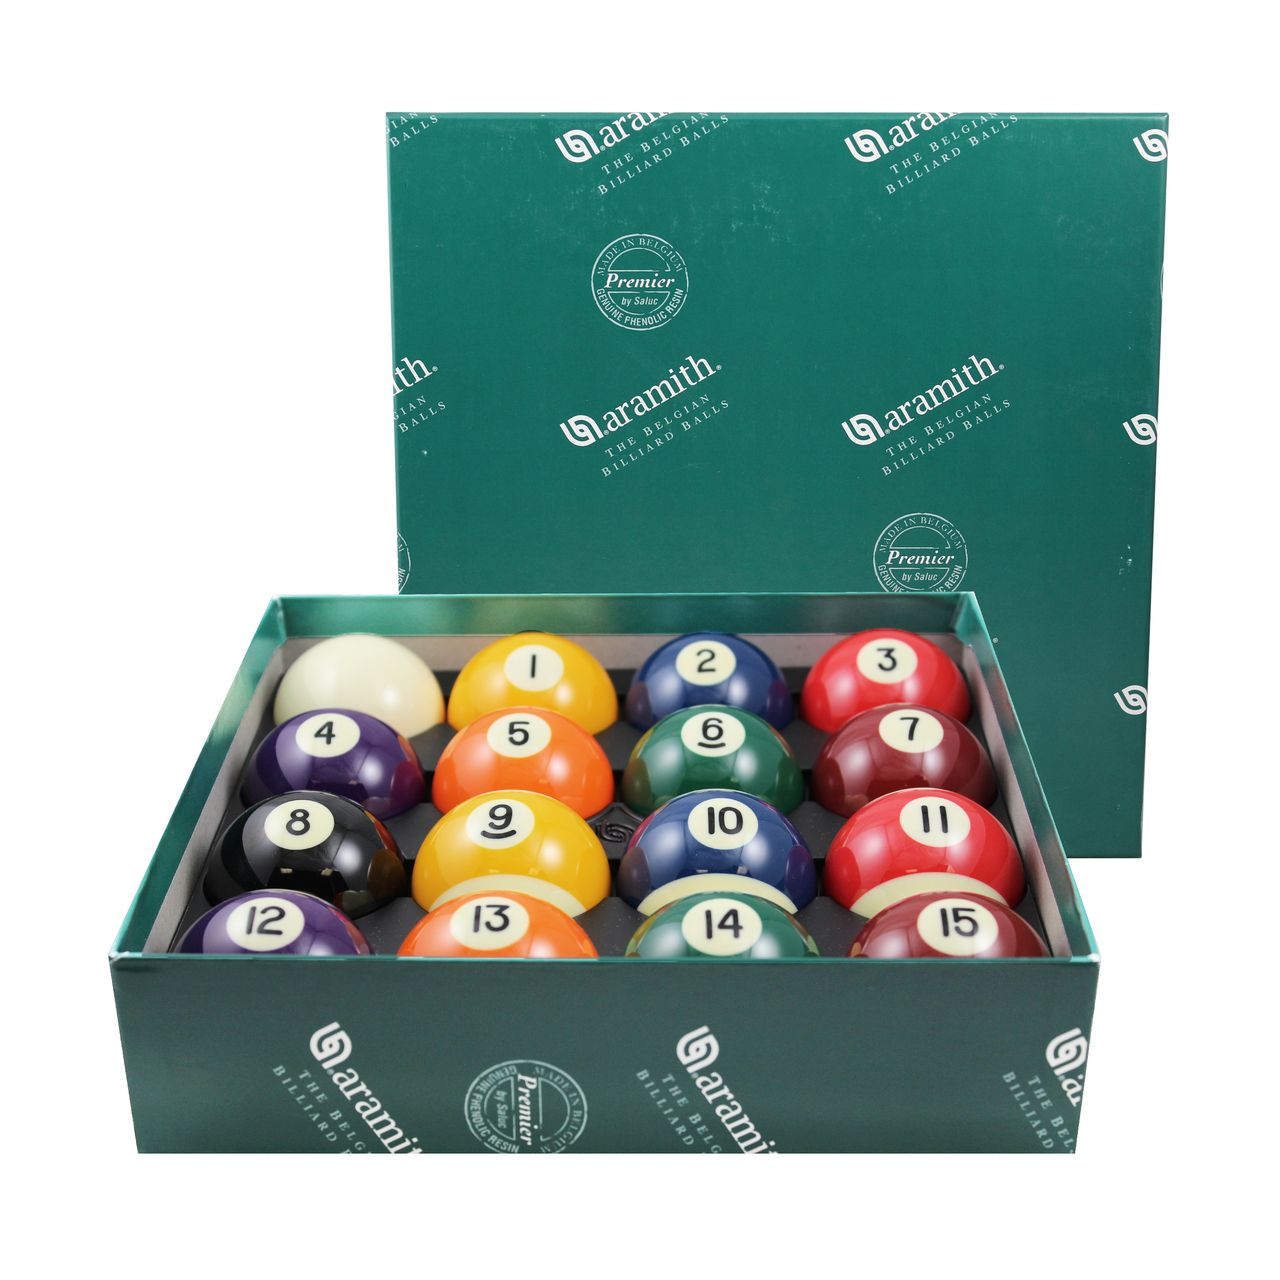 Aramith Premier 2 1/4In. Billiard Ball Set Billiards